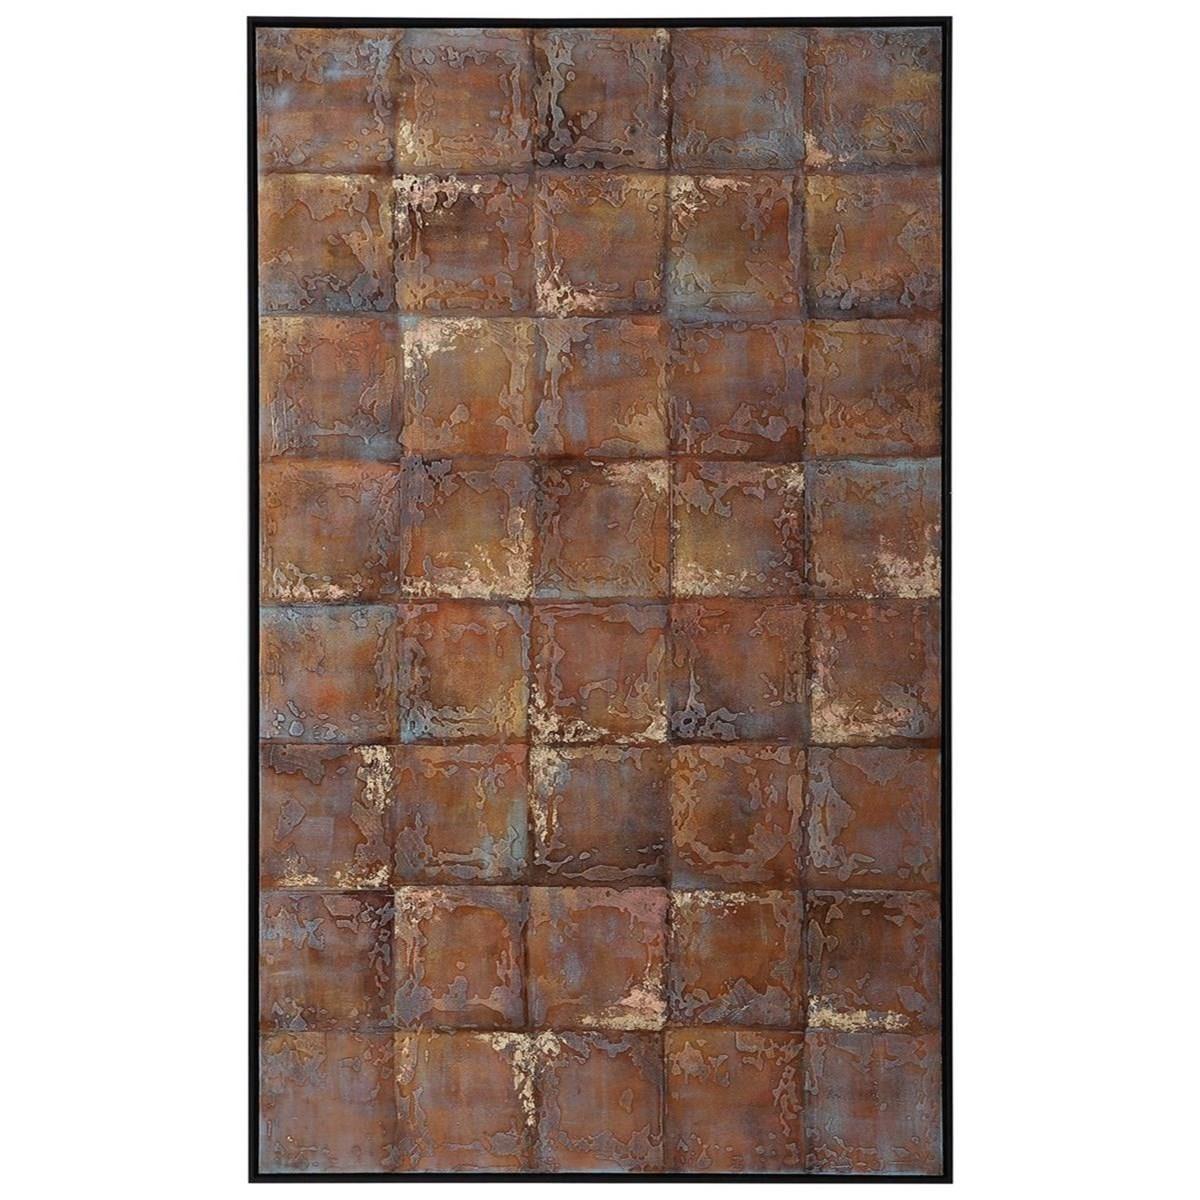 Metallic Tiles Hand Painted Canvas